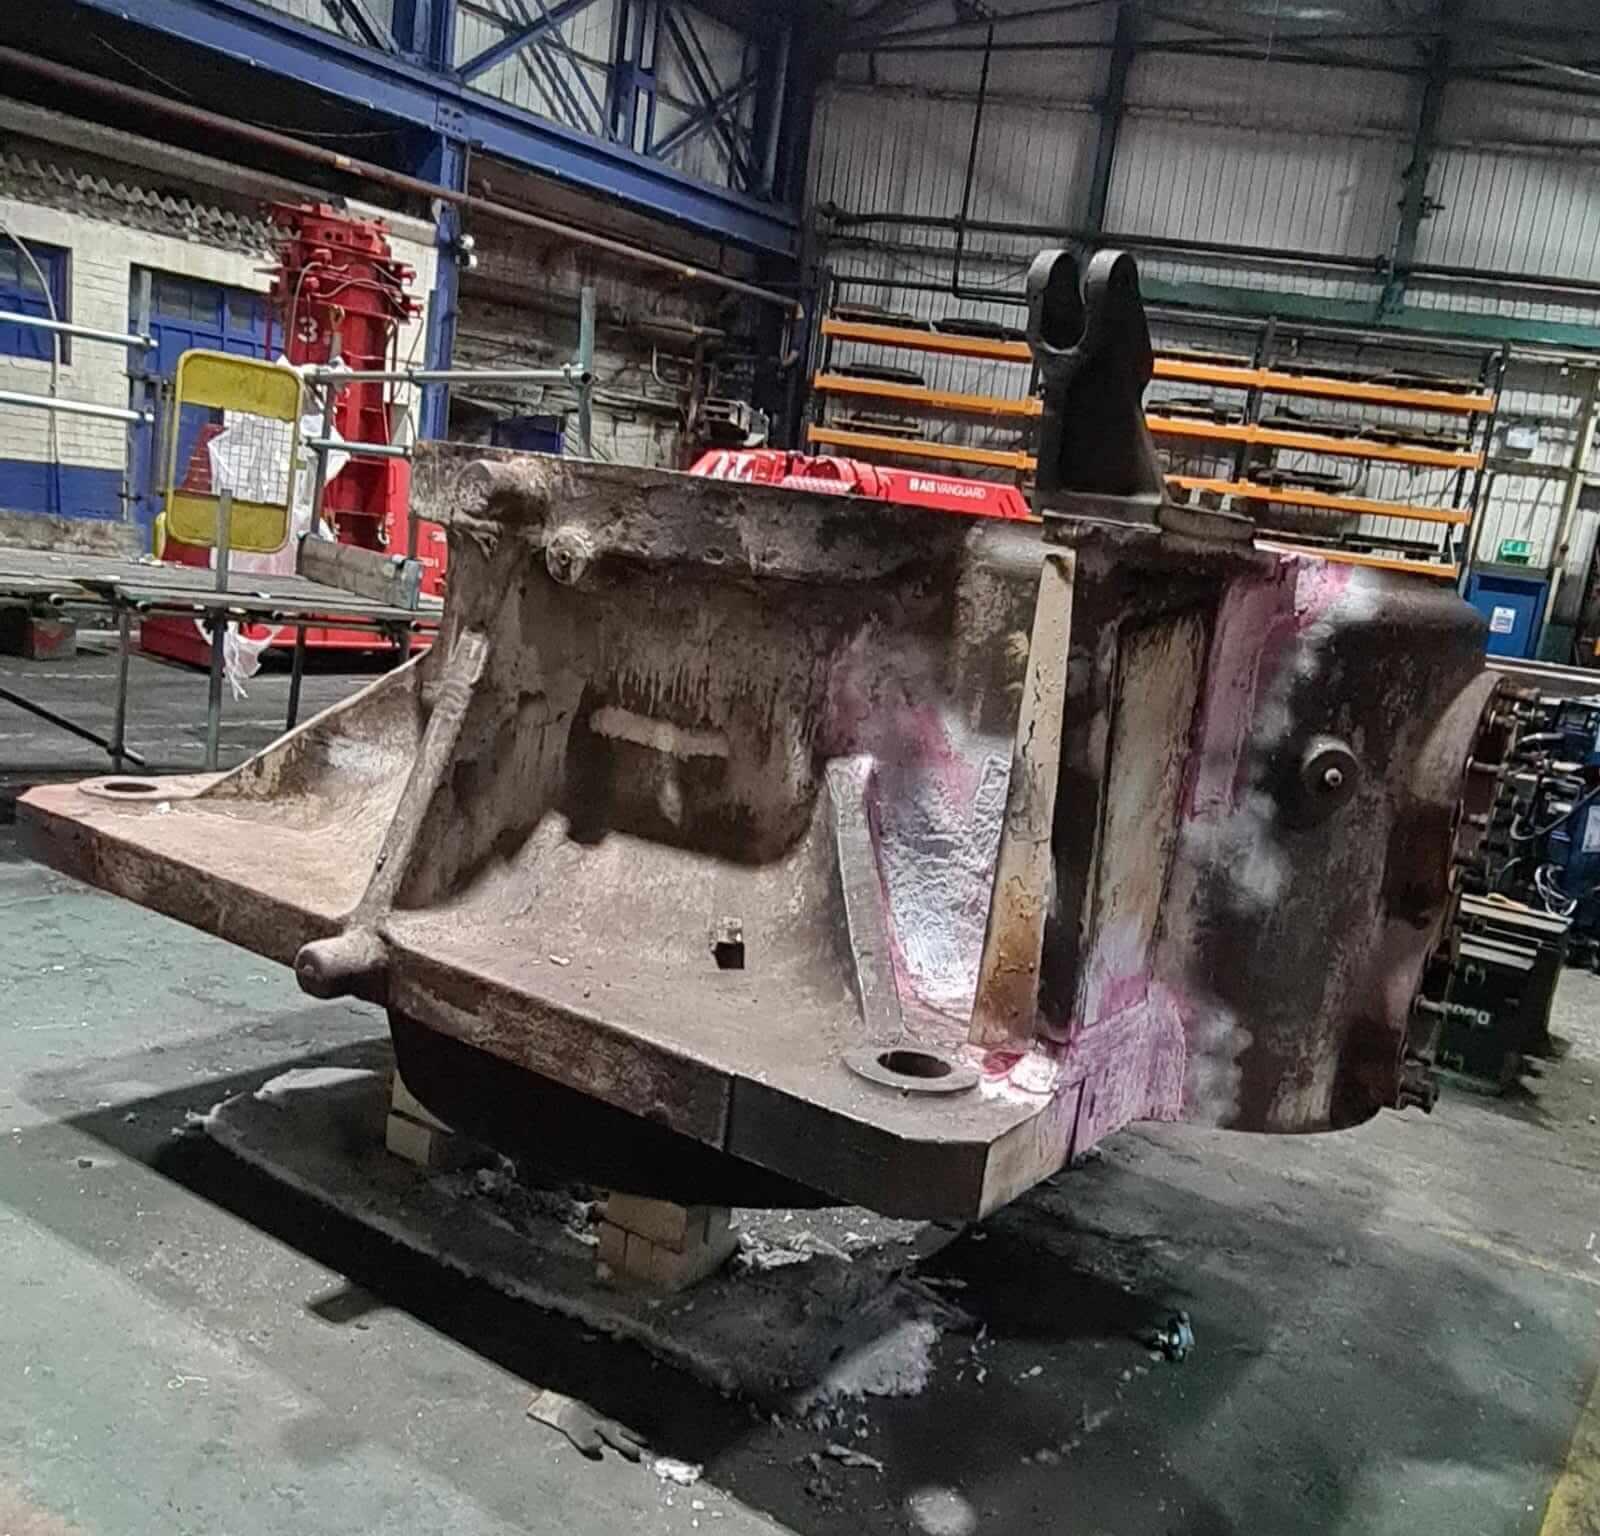 Industry steel casting welding project